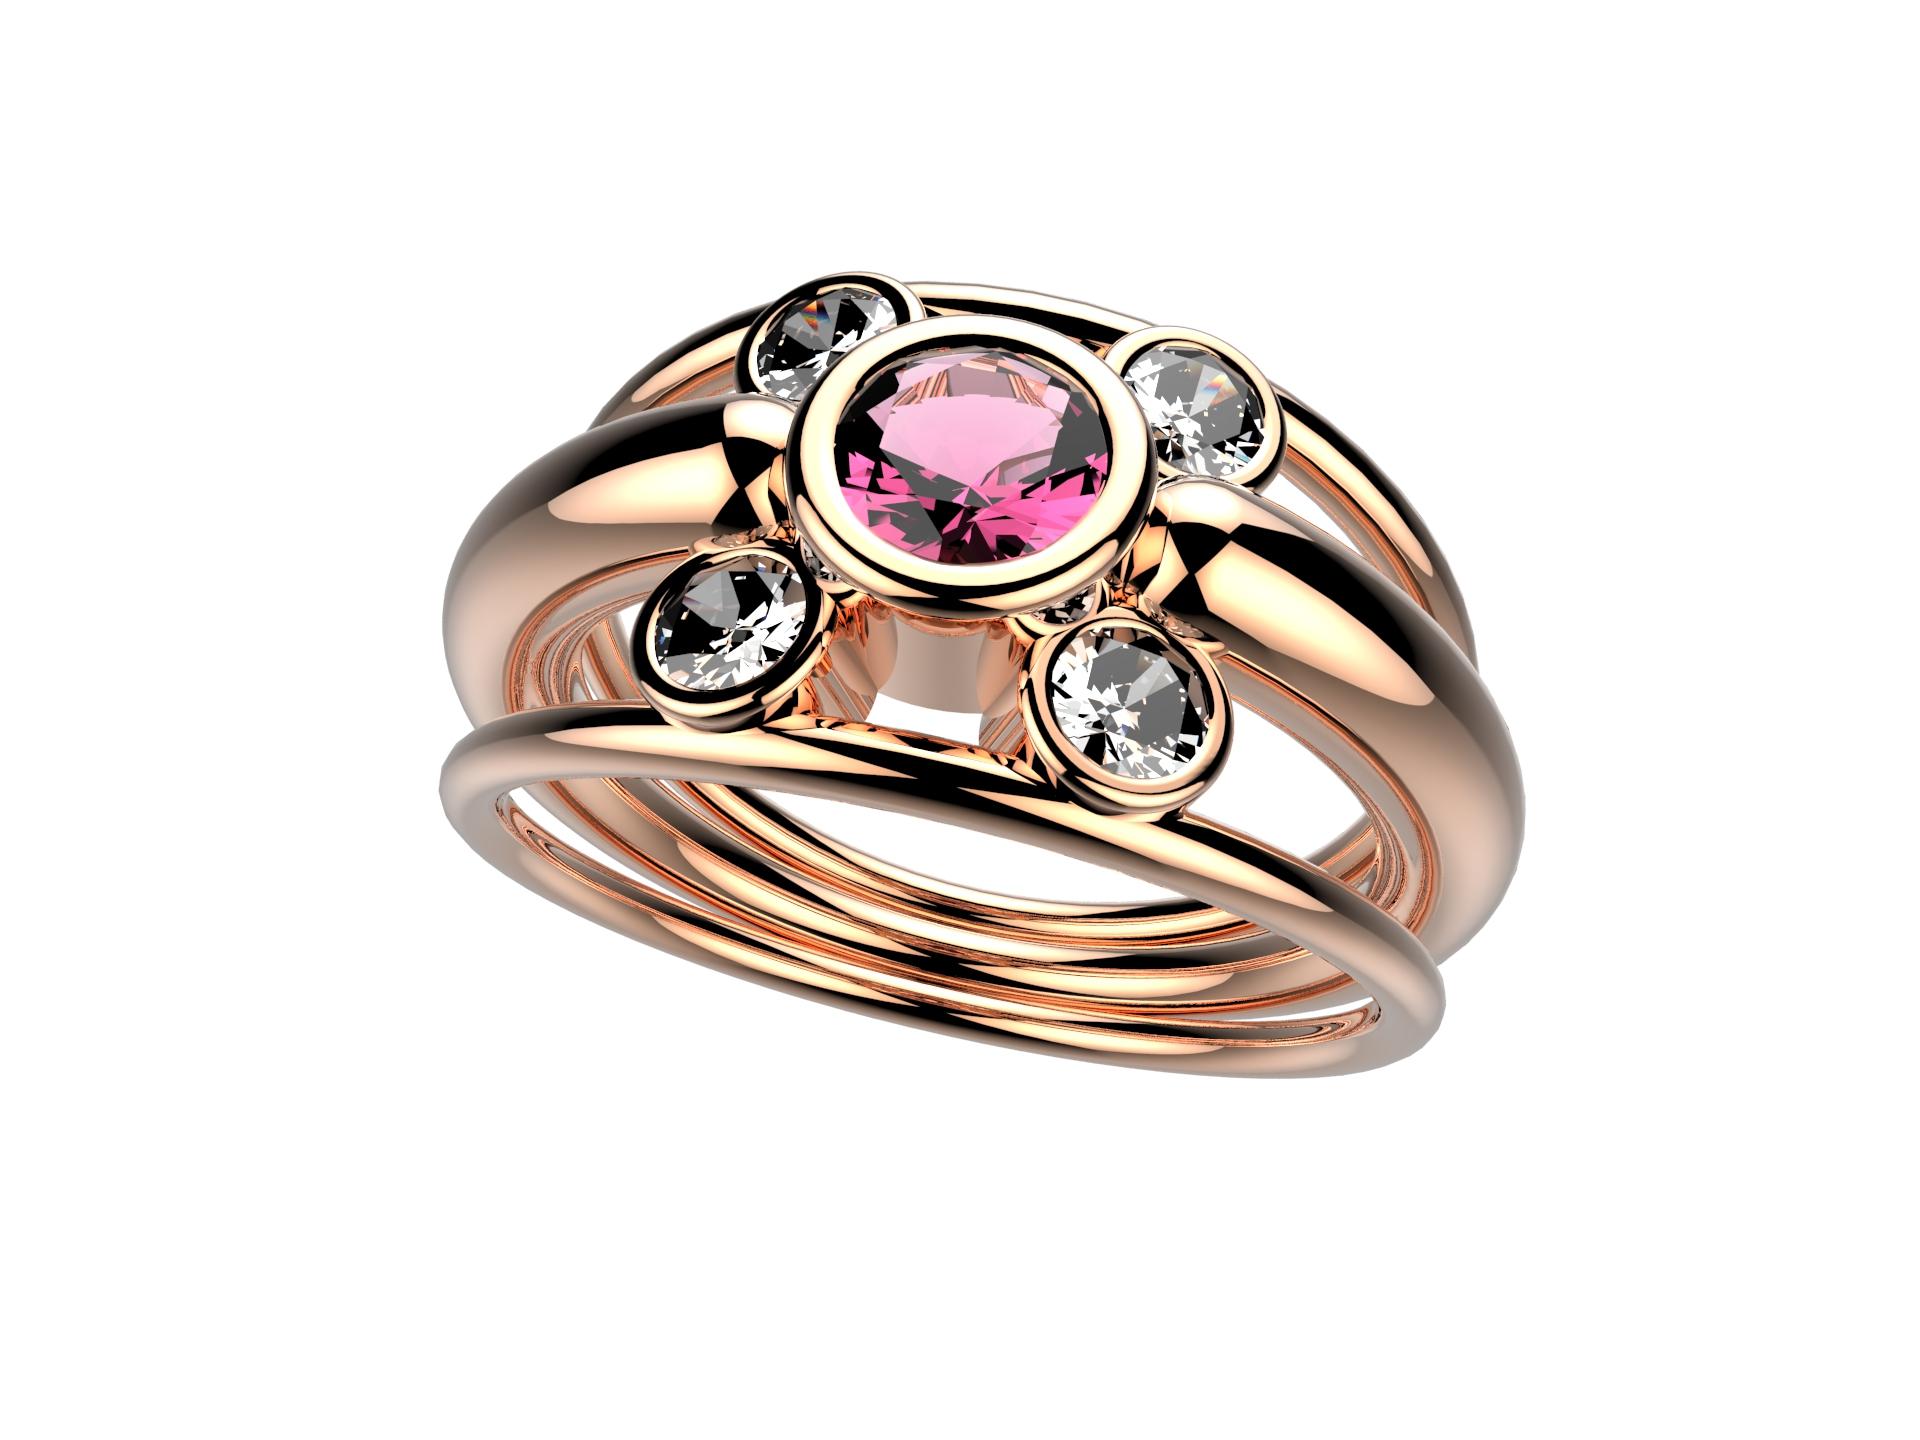 Bague or rose tourmaline diam 2830 €